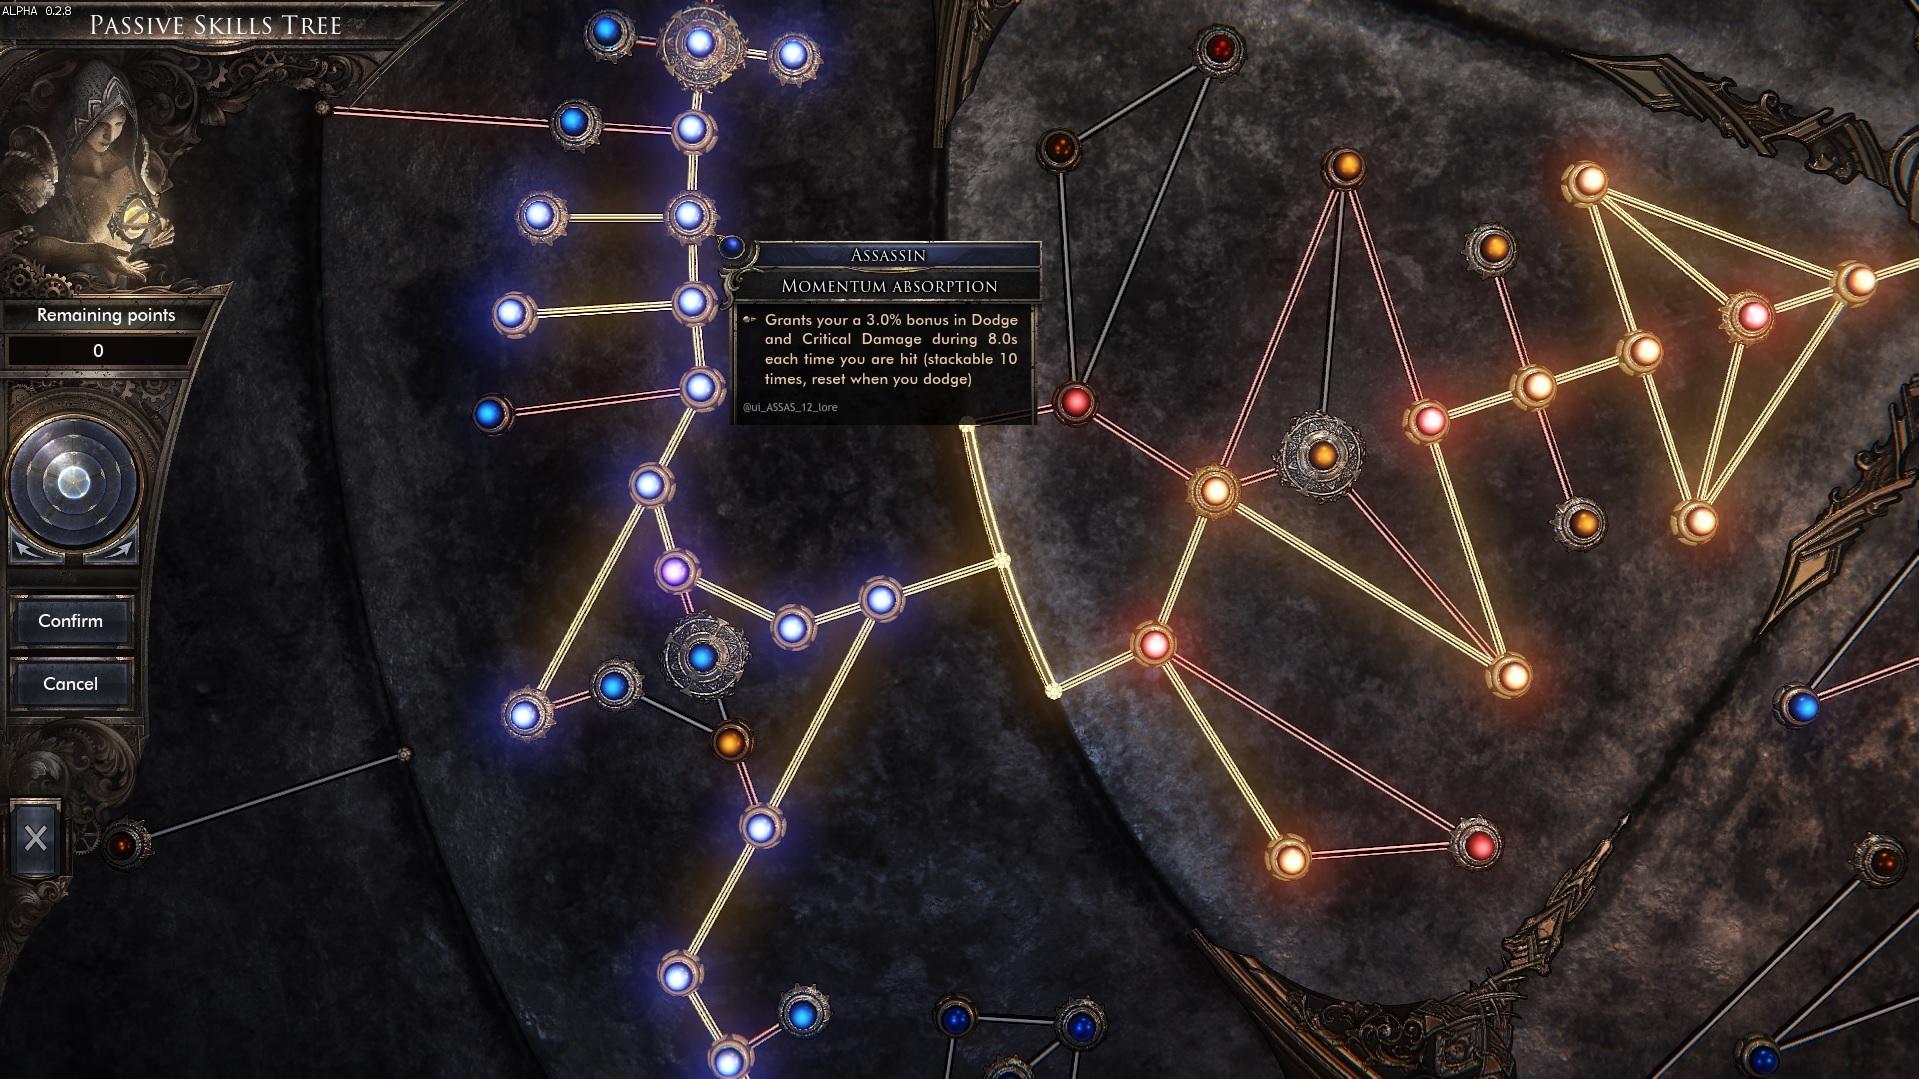 Work in Progress : New Passive Skills Tree ! | Wolcen